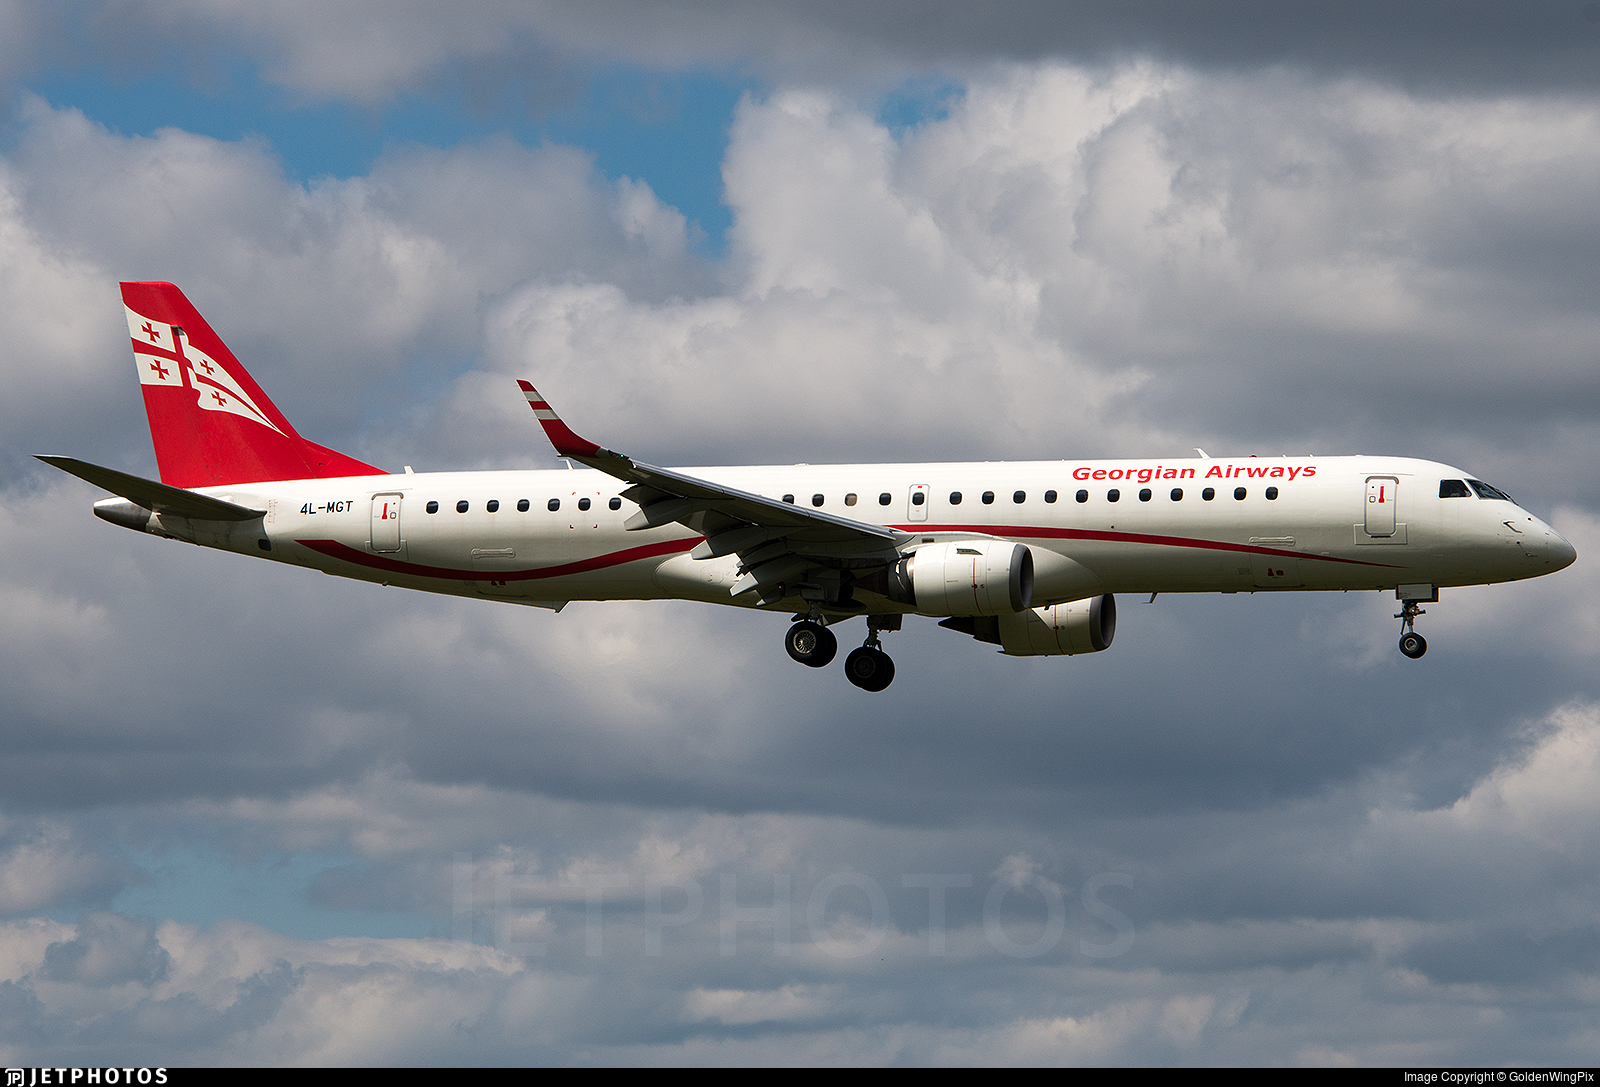 4L-MGT - Embraer 190-200LR - Georgian Airways